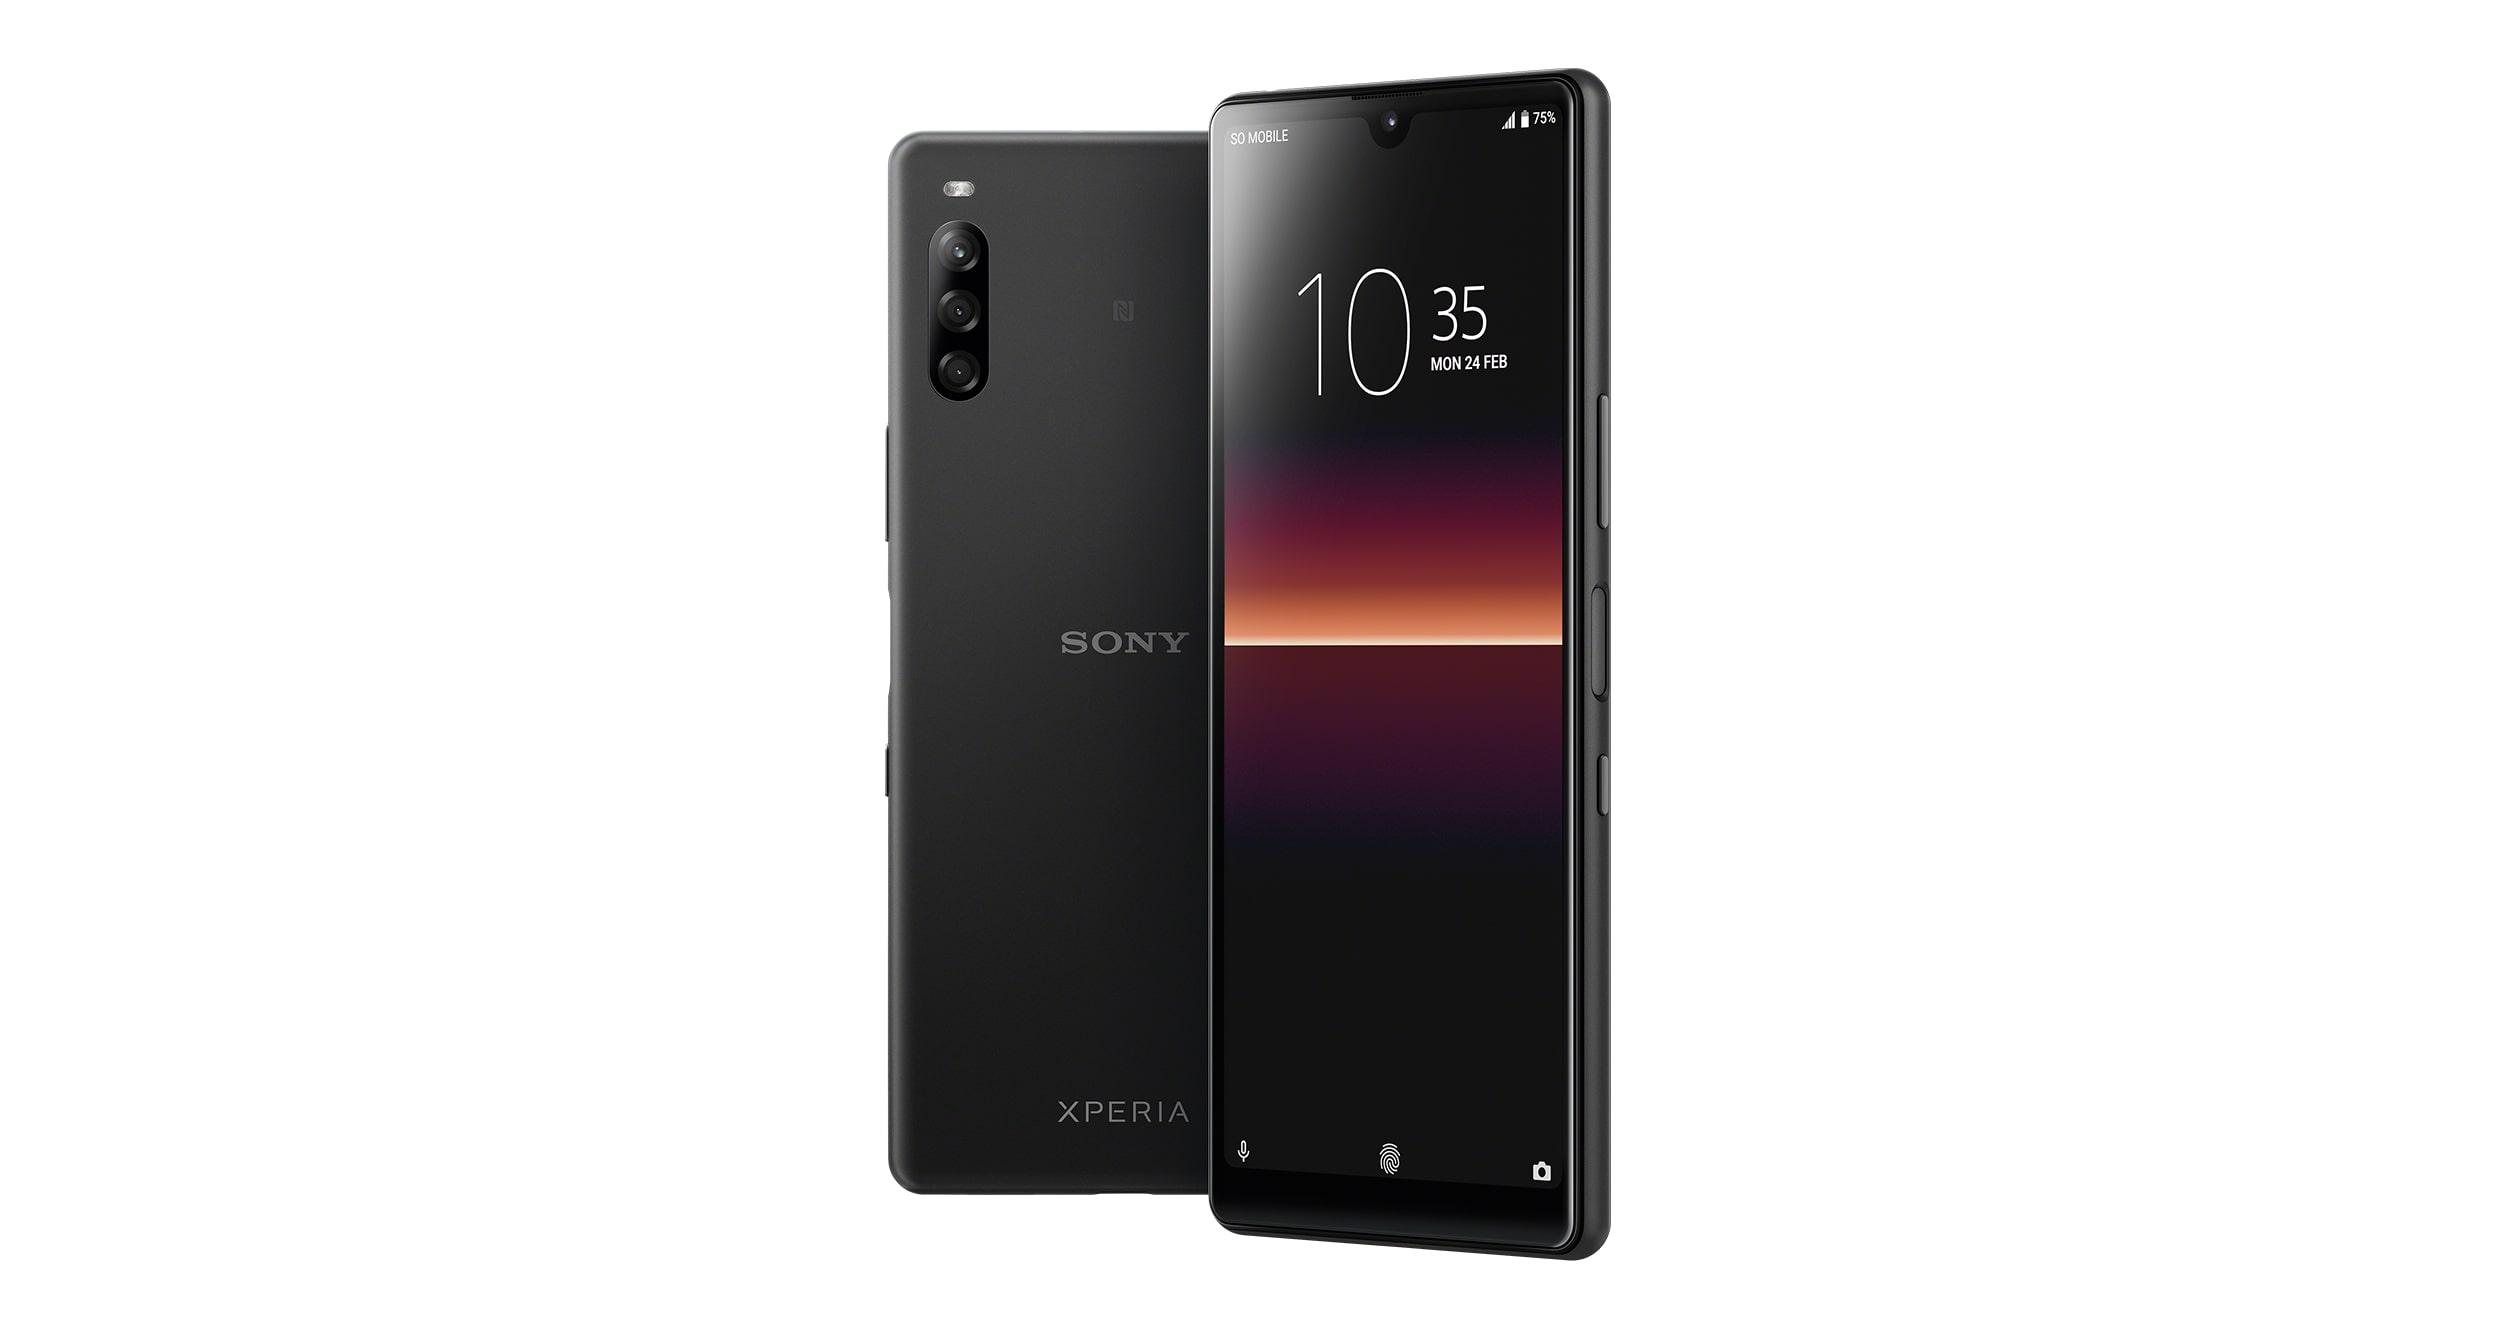 Tilbehør til Sony Xperia telefoner Elkjøp